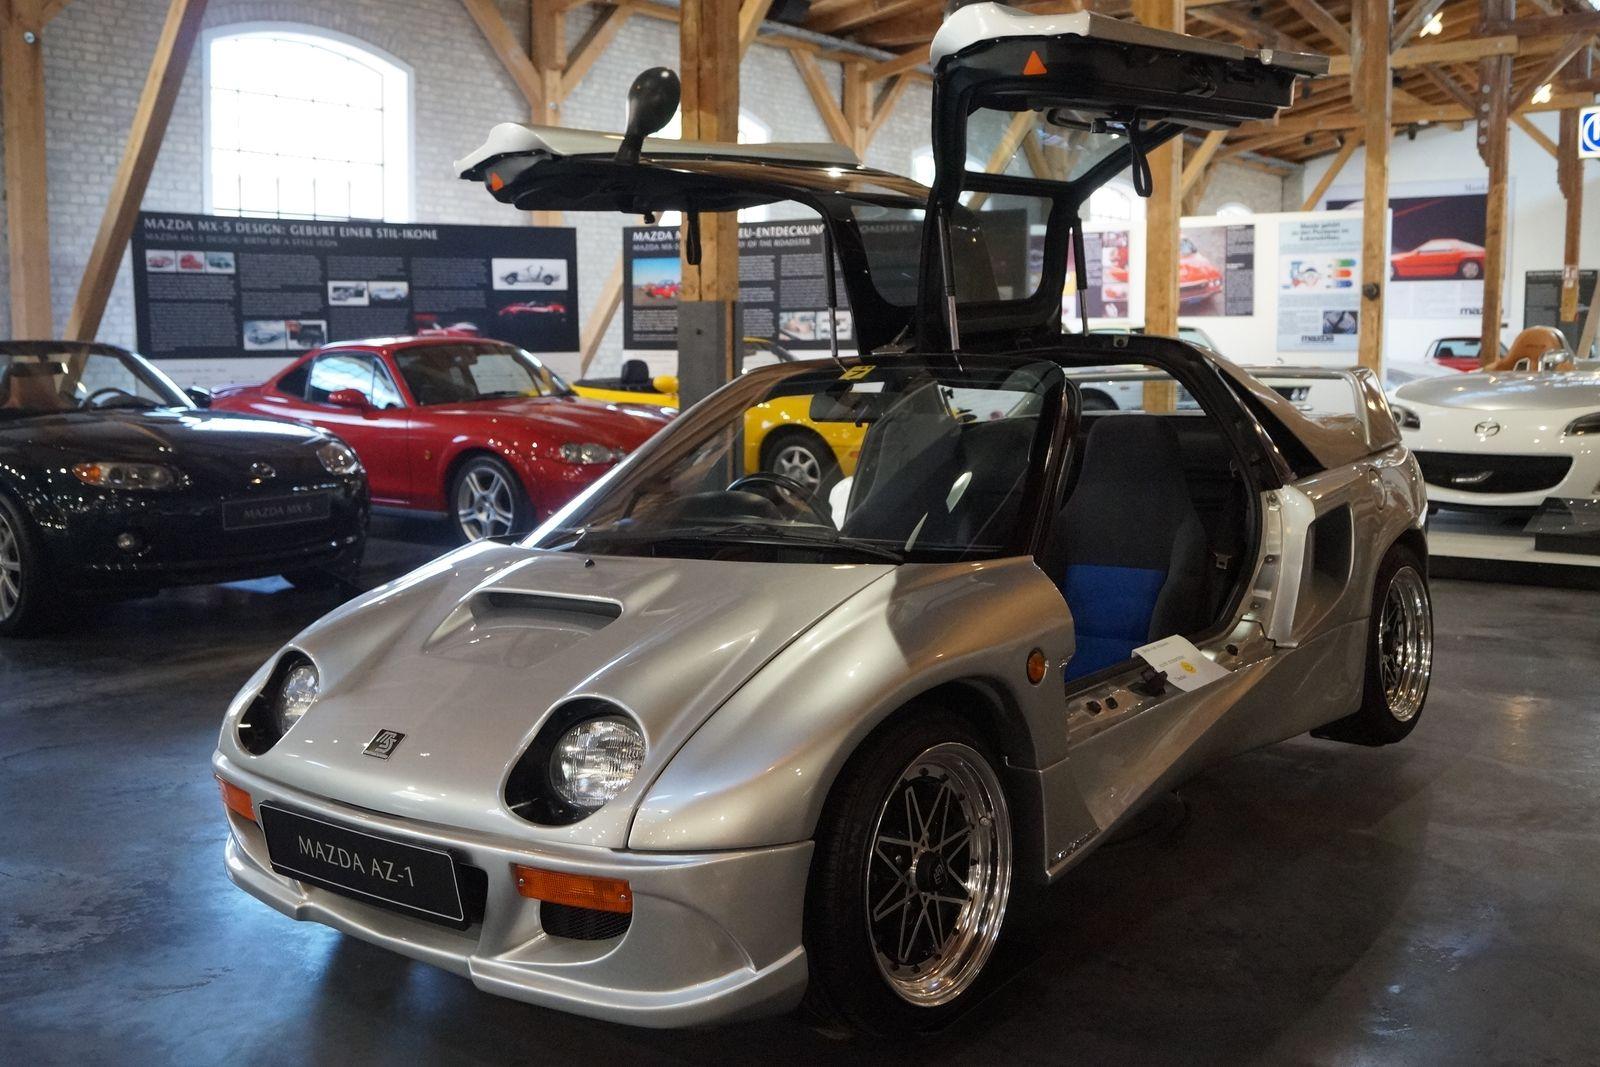 100 Jahre Mazda - Autozam AZ1